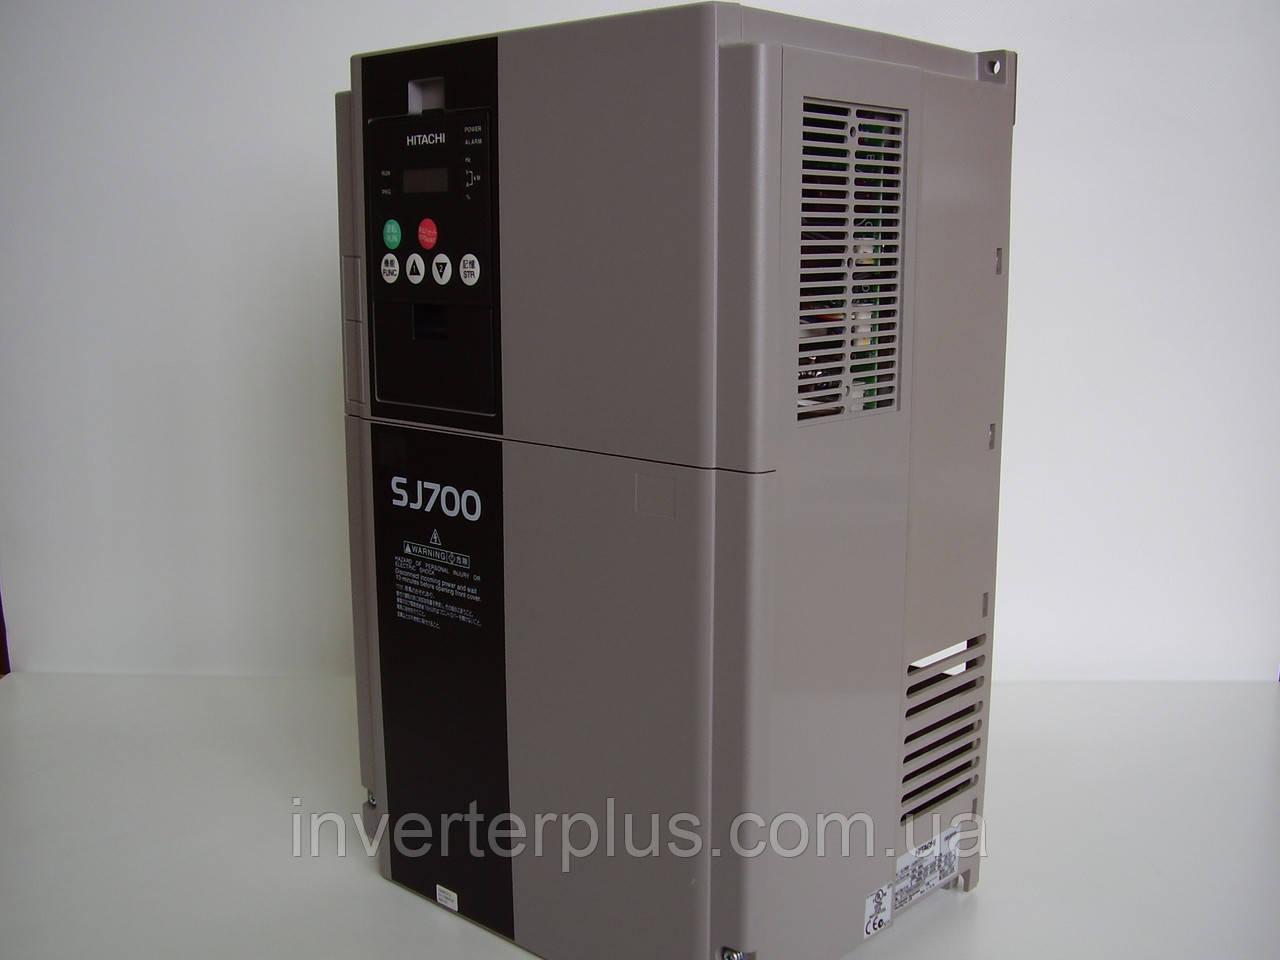 SJ700D-750HFEF3, 75кВт/380В. Інвертор Hitachi